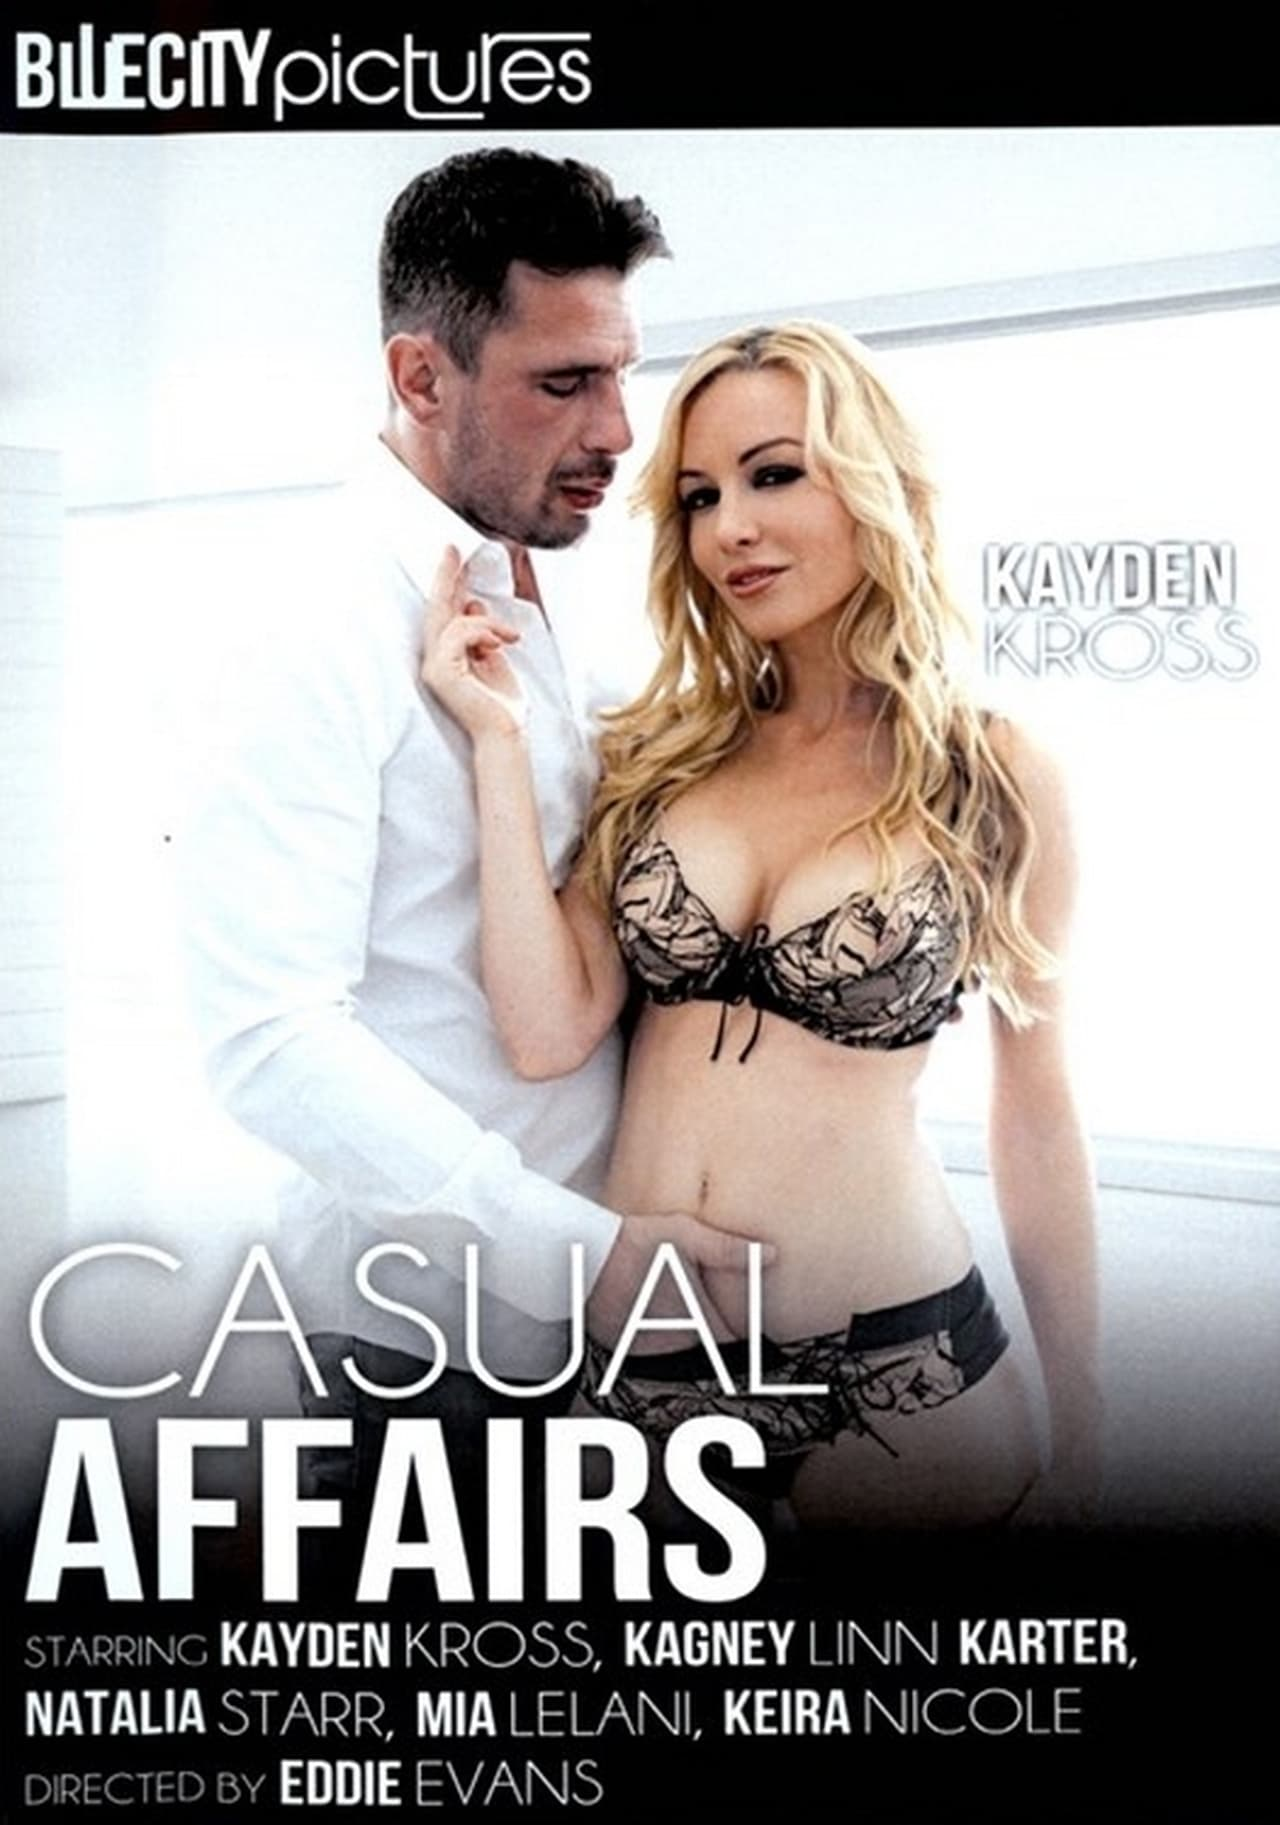 Casual Affairs